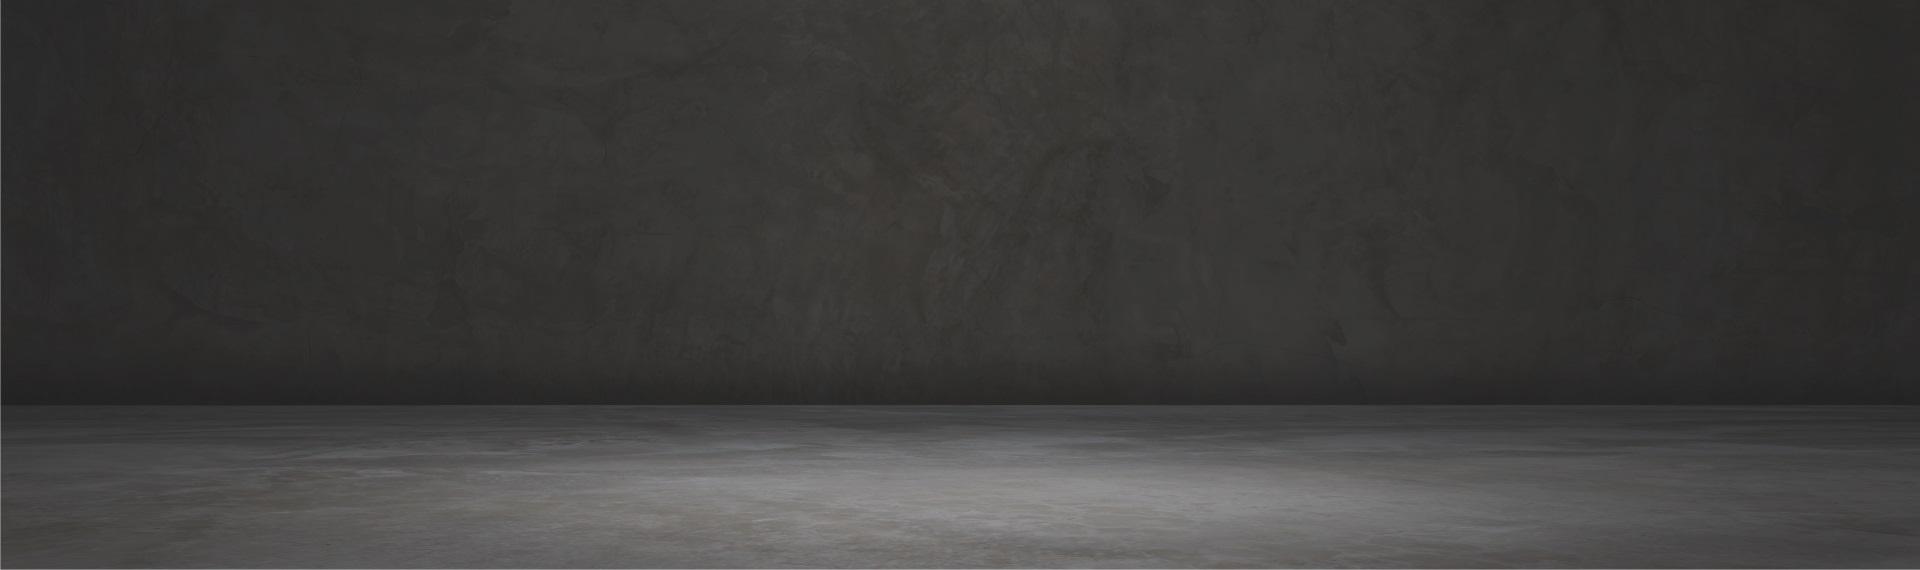 Webinar Fujitsu 29.09.2021 - eDokument background